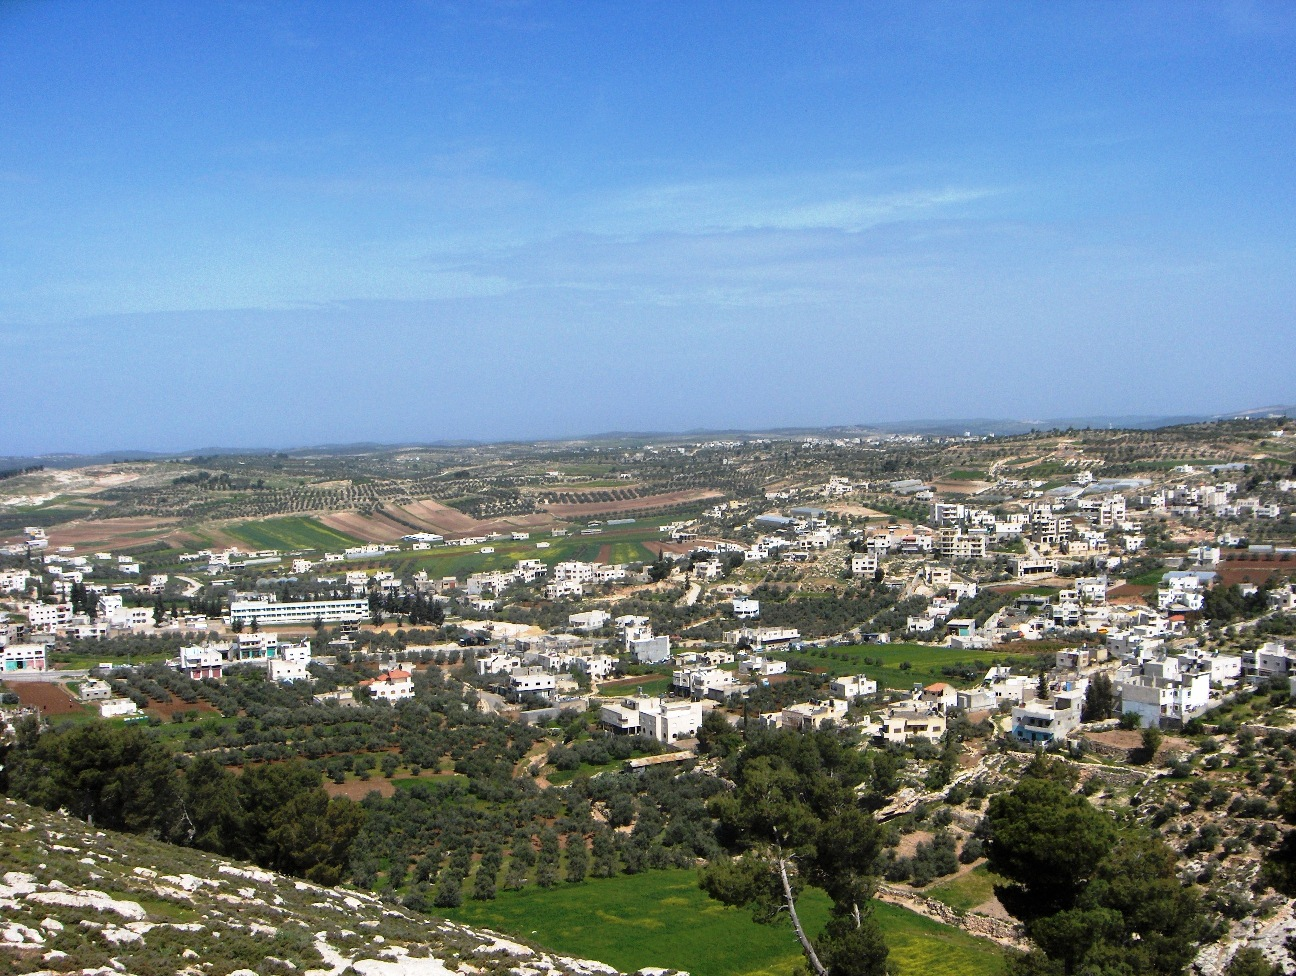 مَعرکہ اَجنادِین (موجودہ صوبہ الخلیل فلسطین) ۔ امیج نمبر 2